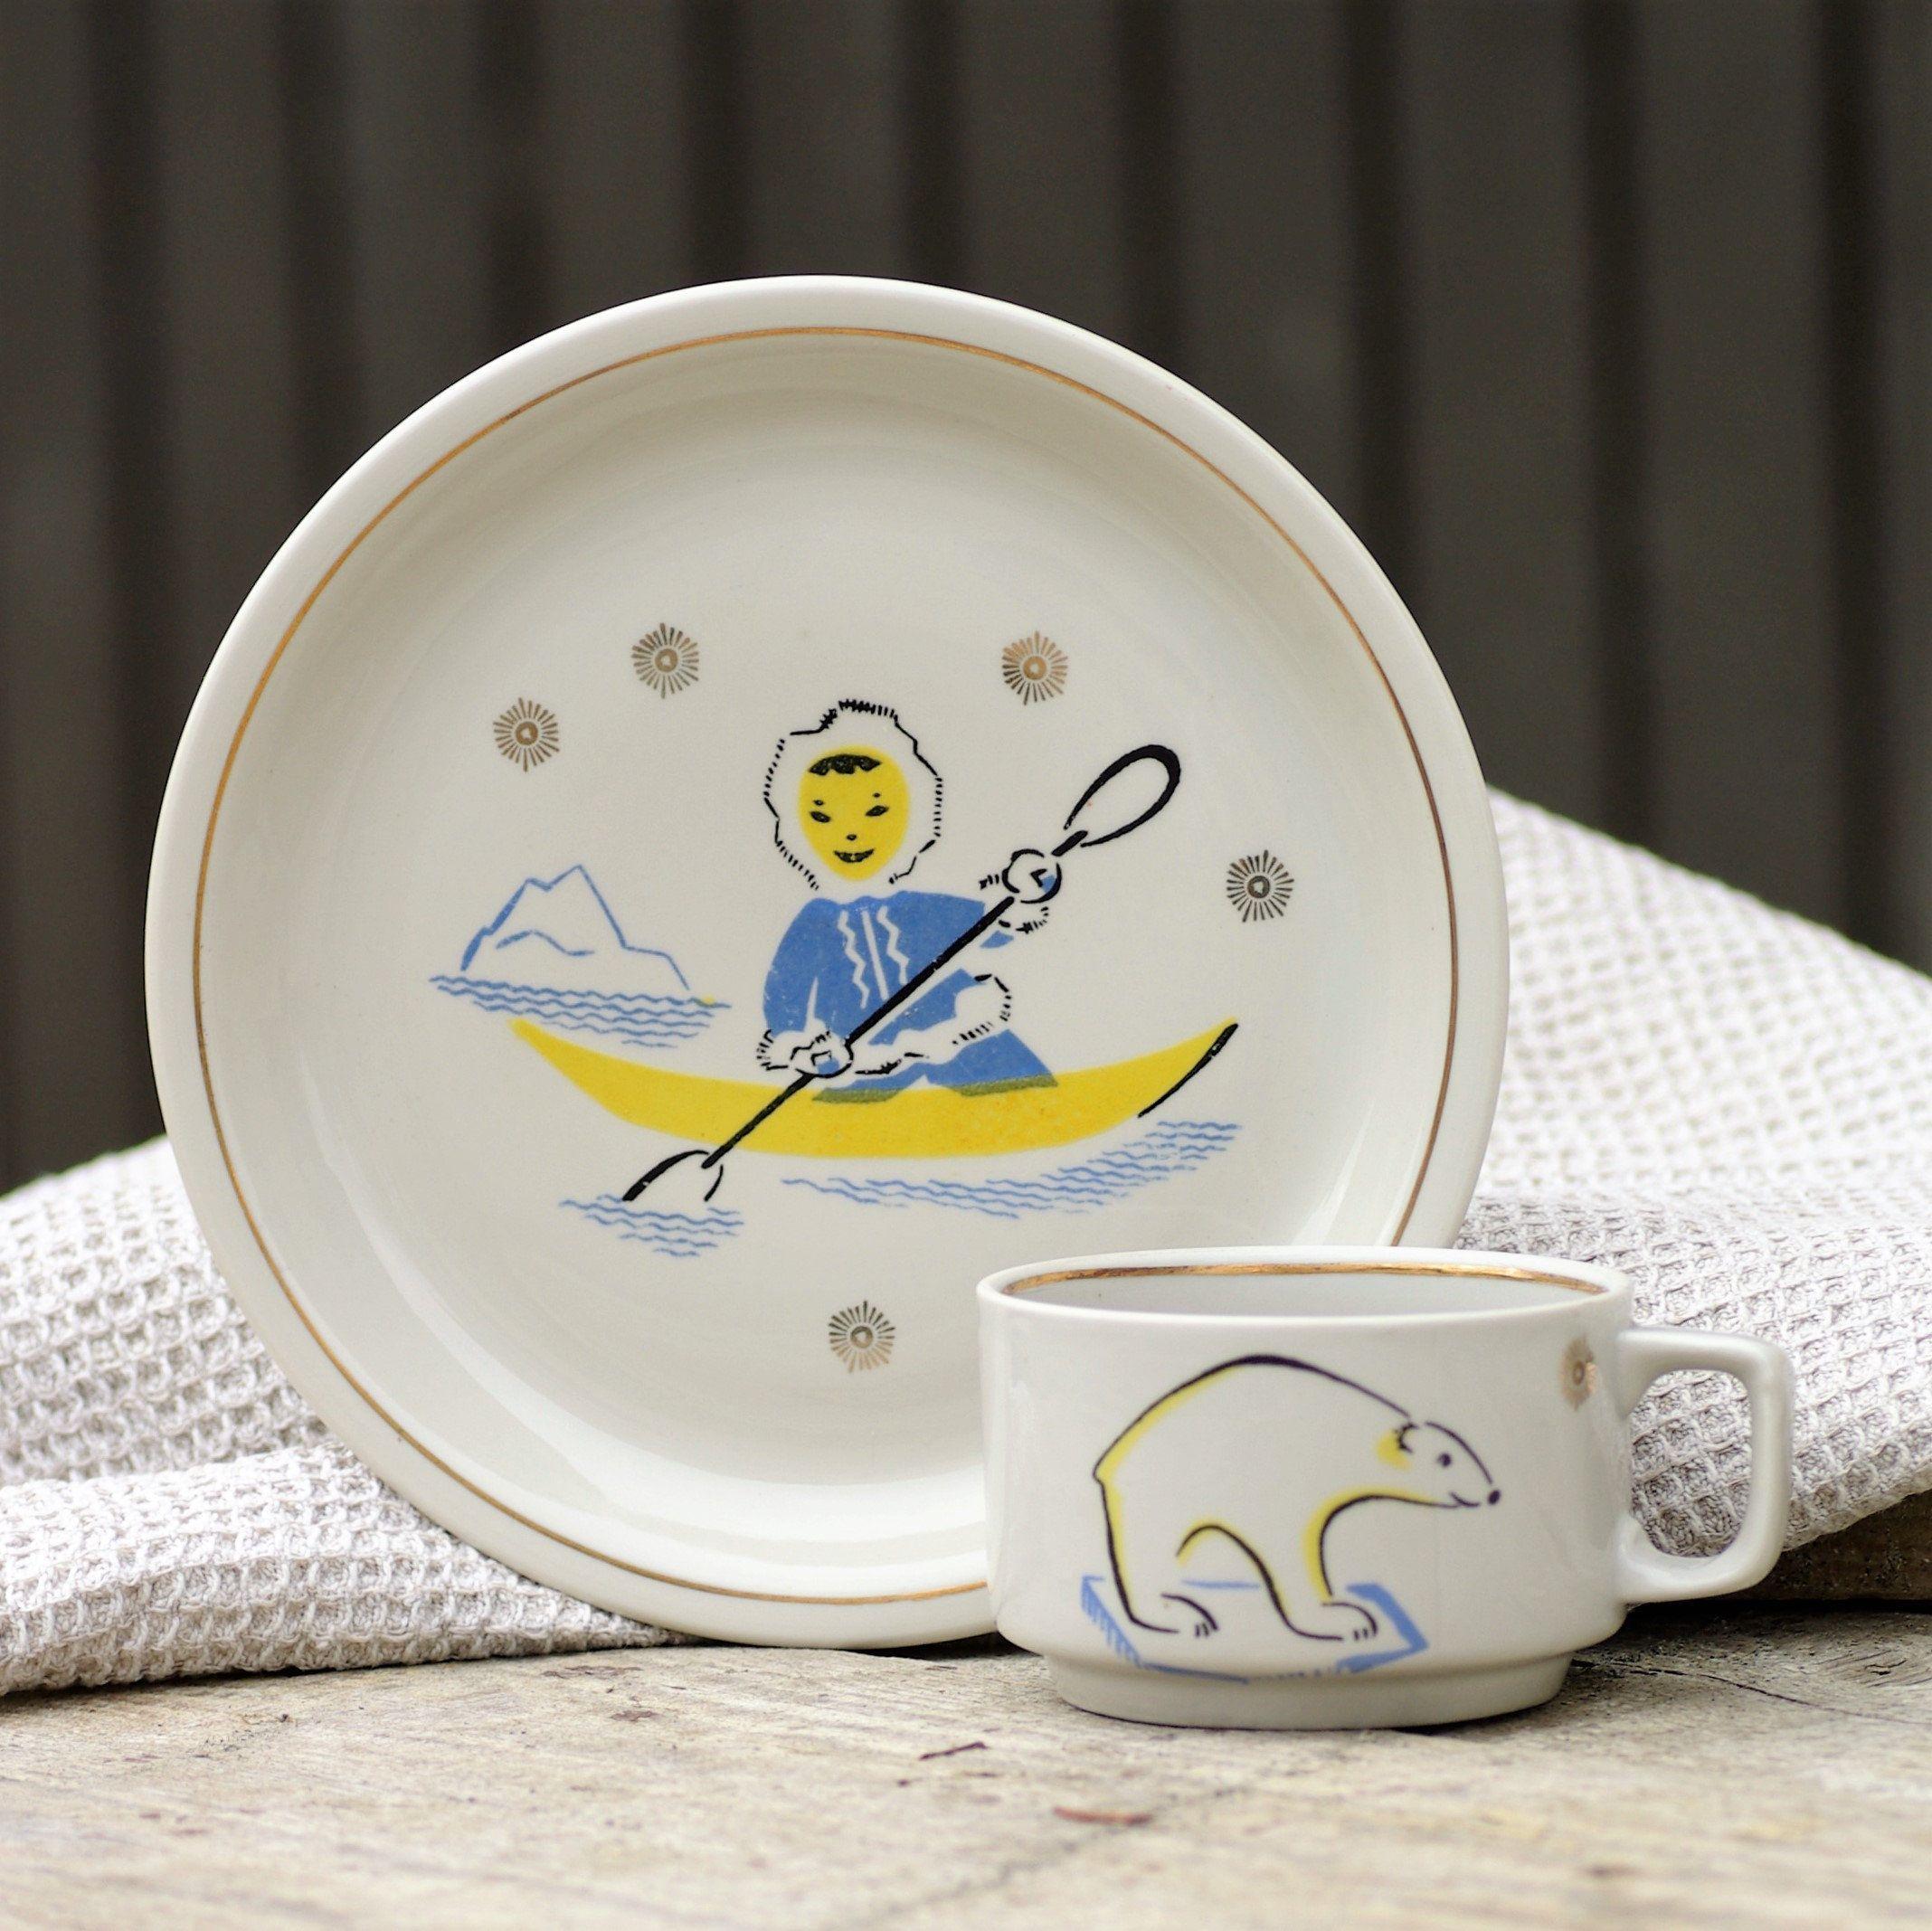 Soviet Kids Plate And Mug Set With Polar Pattern Childrens Kids Tableware With Eskimo Inuite Boy And White Bear Dinnerware For Kids Kids Tableware Kids Plates Mugs Set